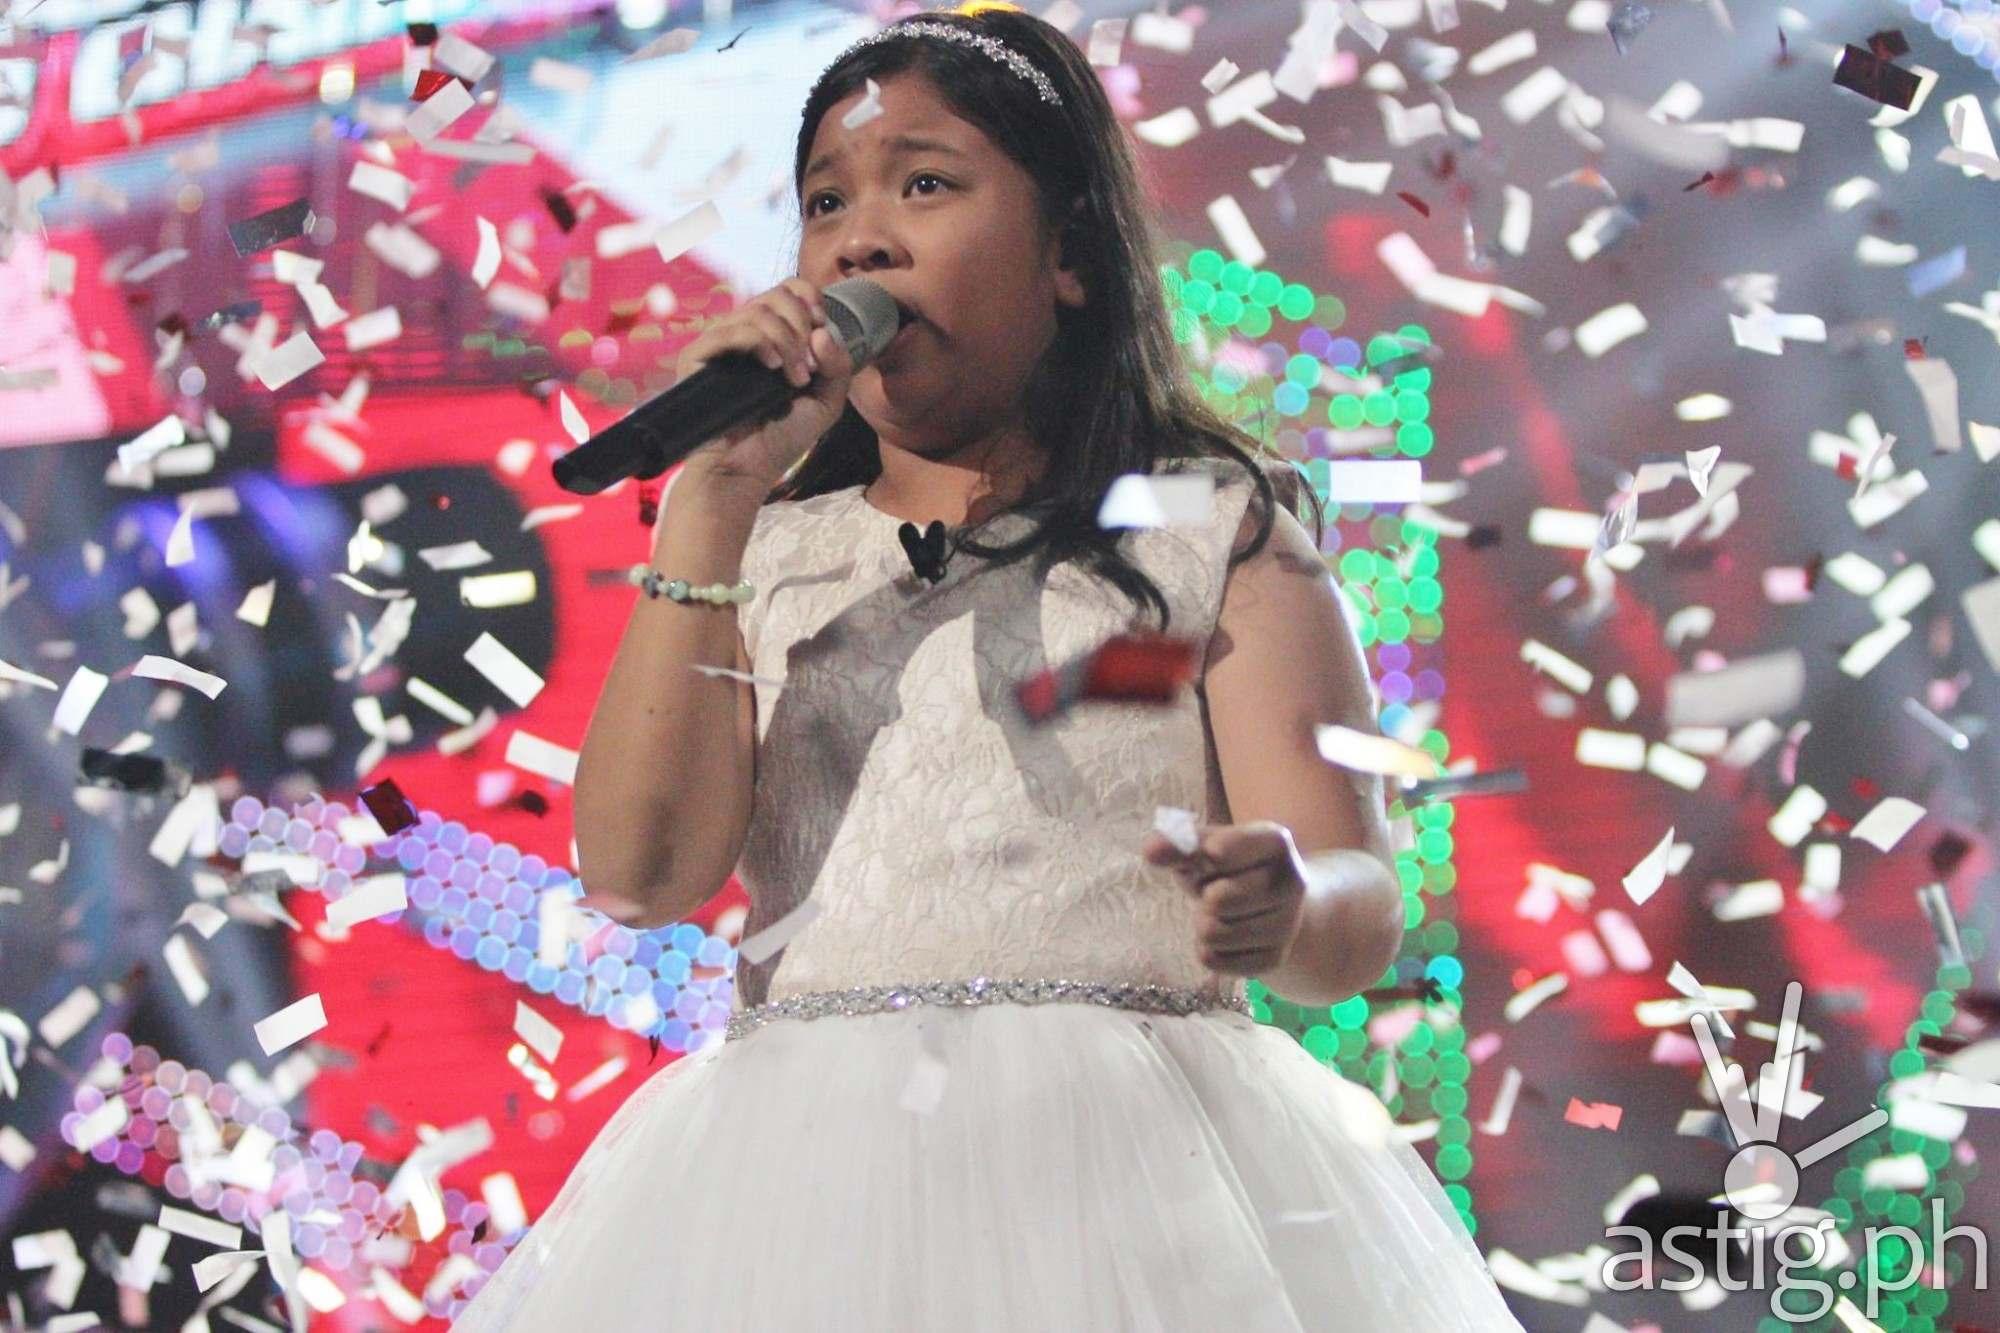 The Voice Kids Season 2 grand champion Elha Nympha performs her winning piece Ikaw Ang Lahat Sa Akin